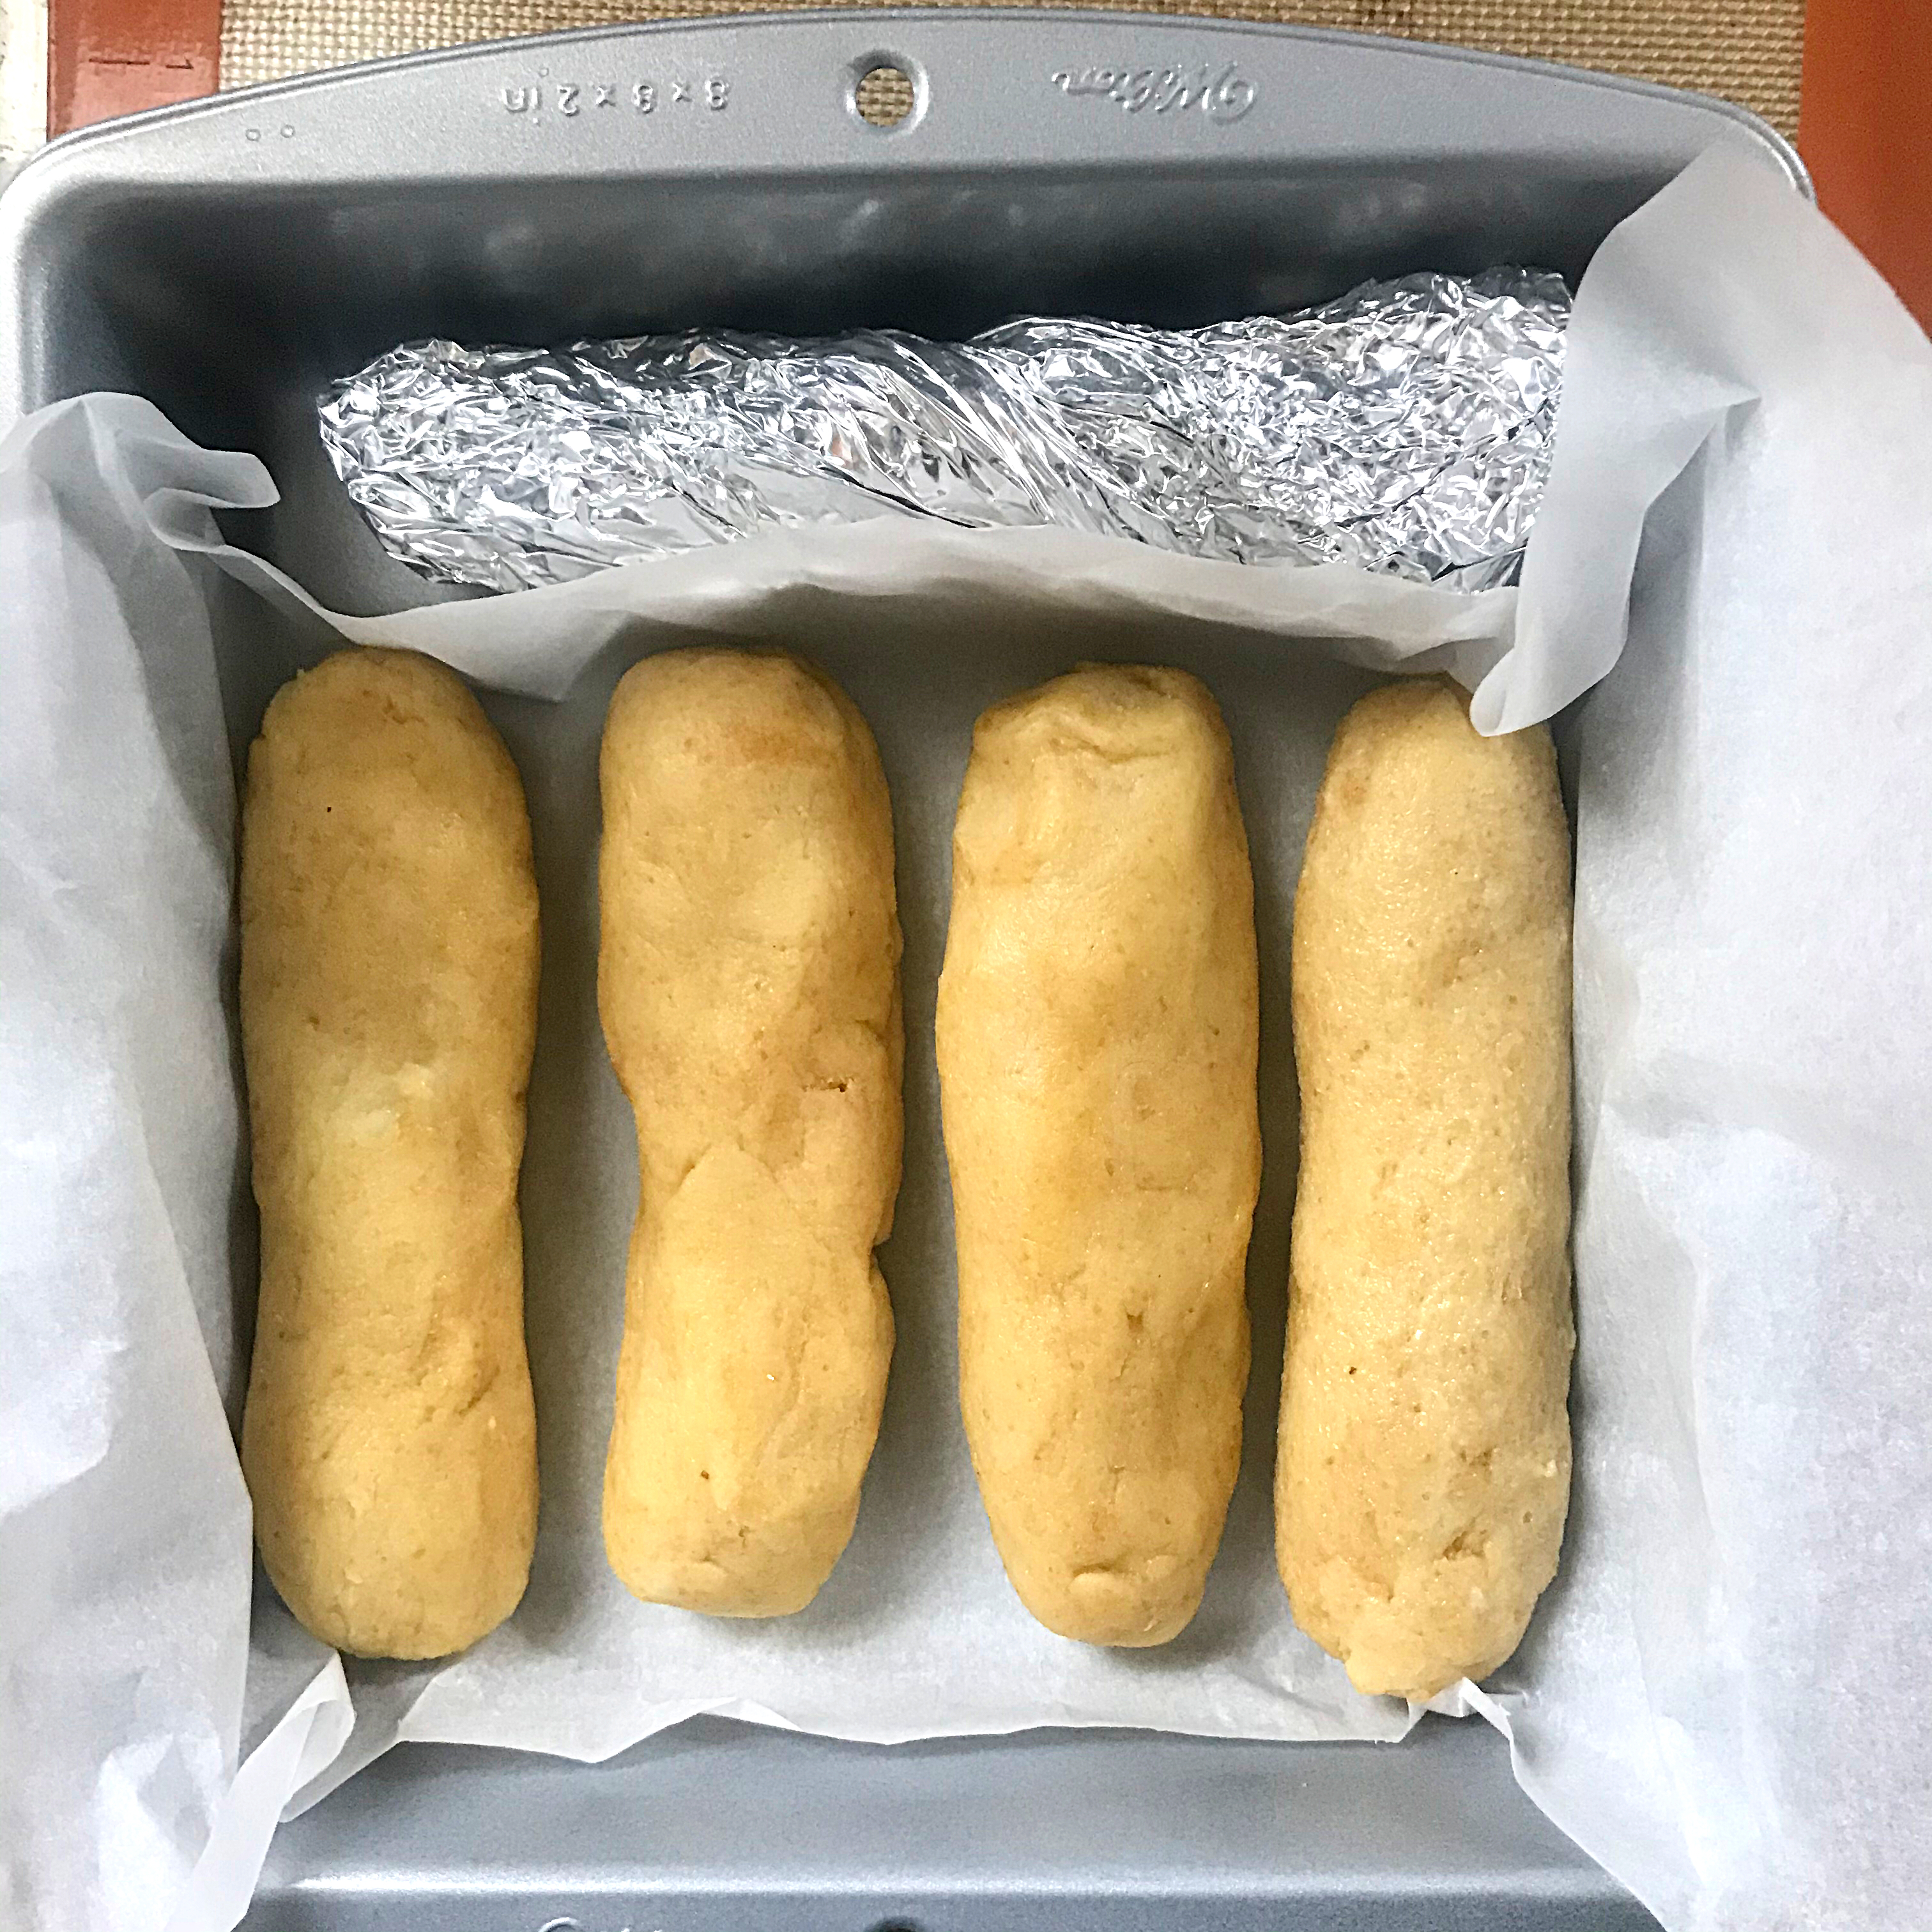 4 keto hot dog buns dough in a square cake pan